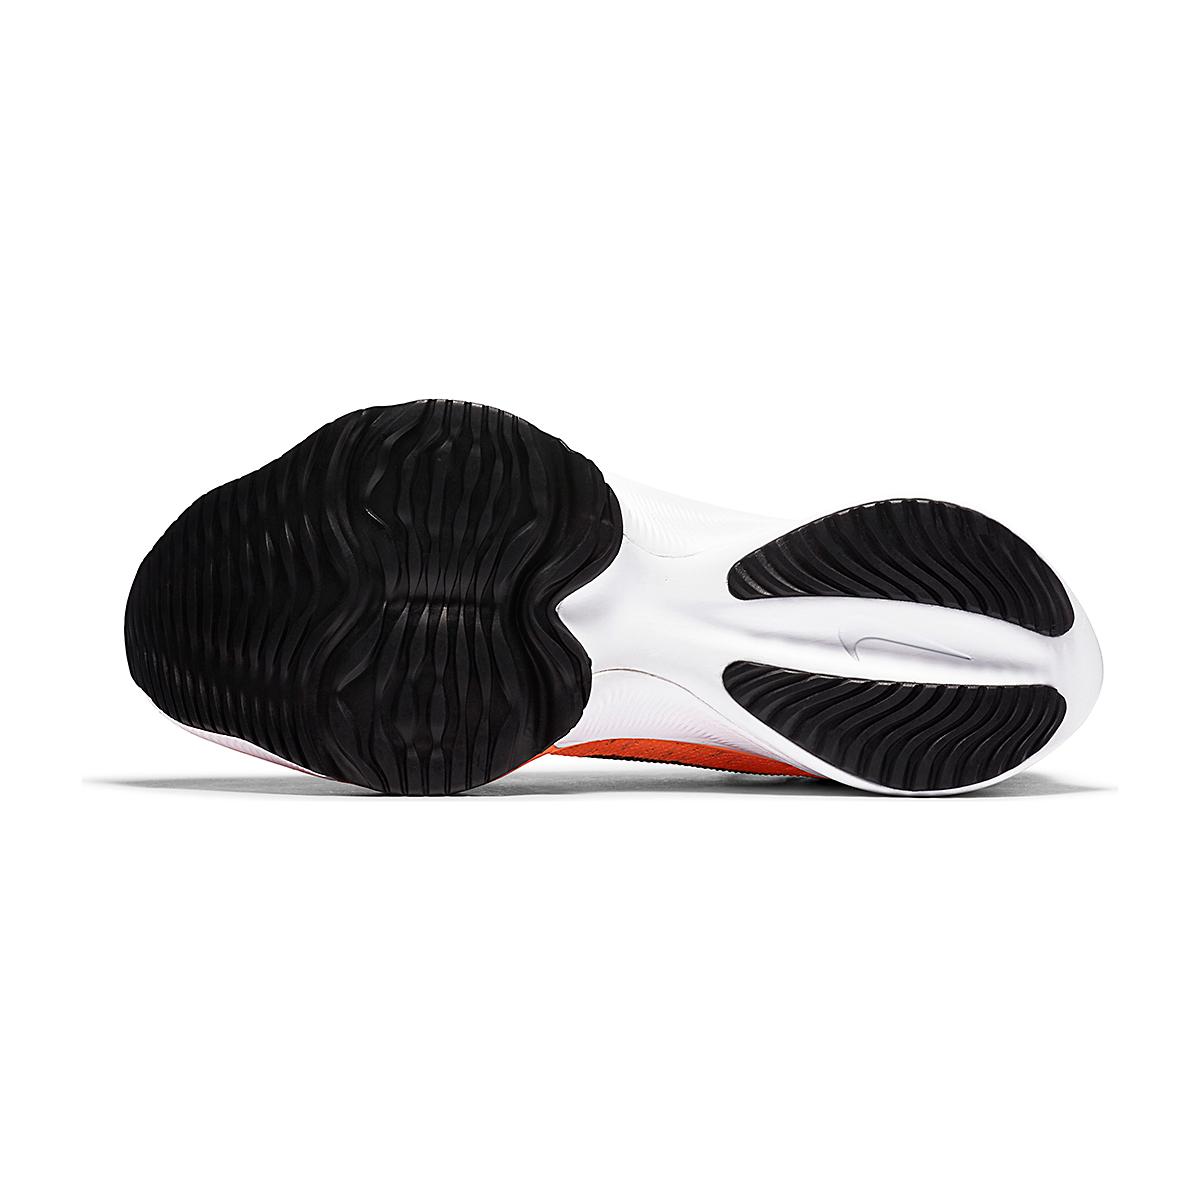 Men's Nike Air Zoom Tempo NEXT% Running Shoe - Color: Bright Mango/Black-Citron Pulse - Size: 6 - Width: Regular, Bright Mango/Black-Citron Pulse, large, image 3